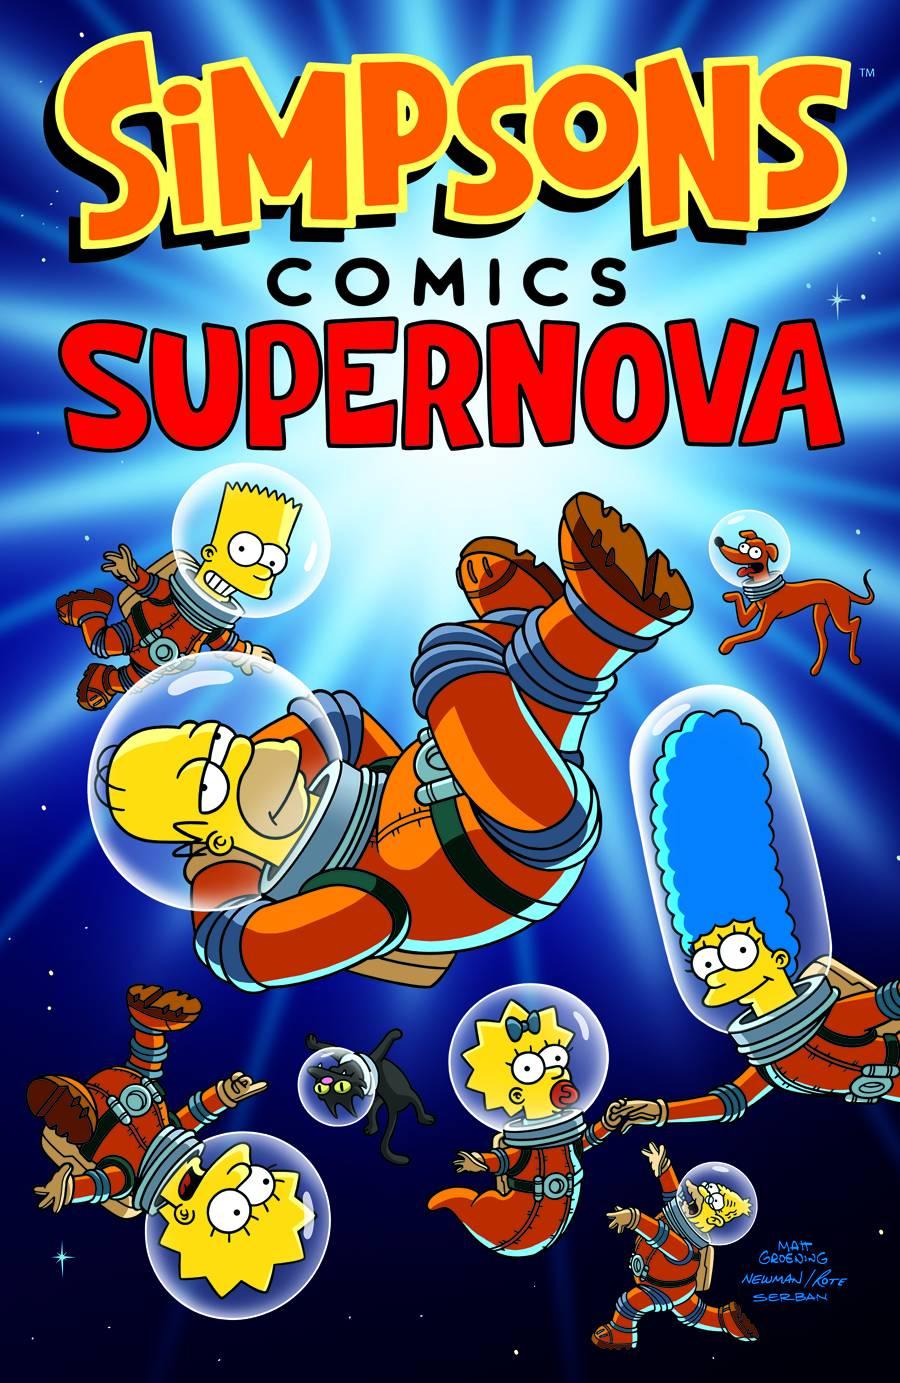 simpsons comics supernova -#main